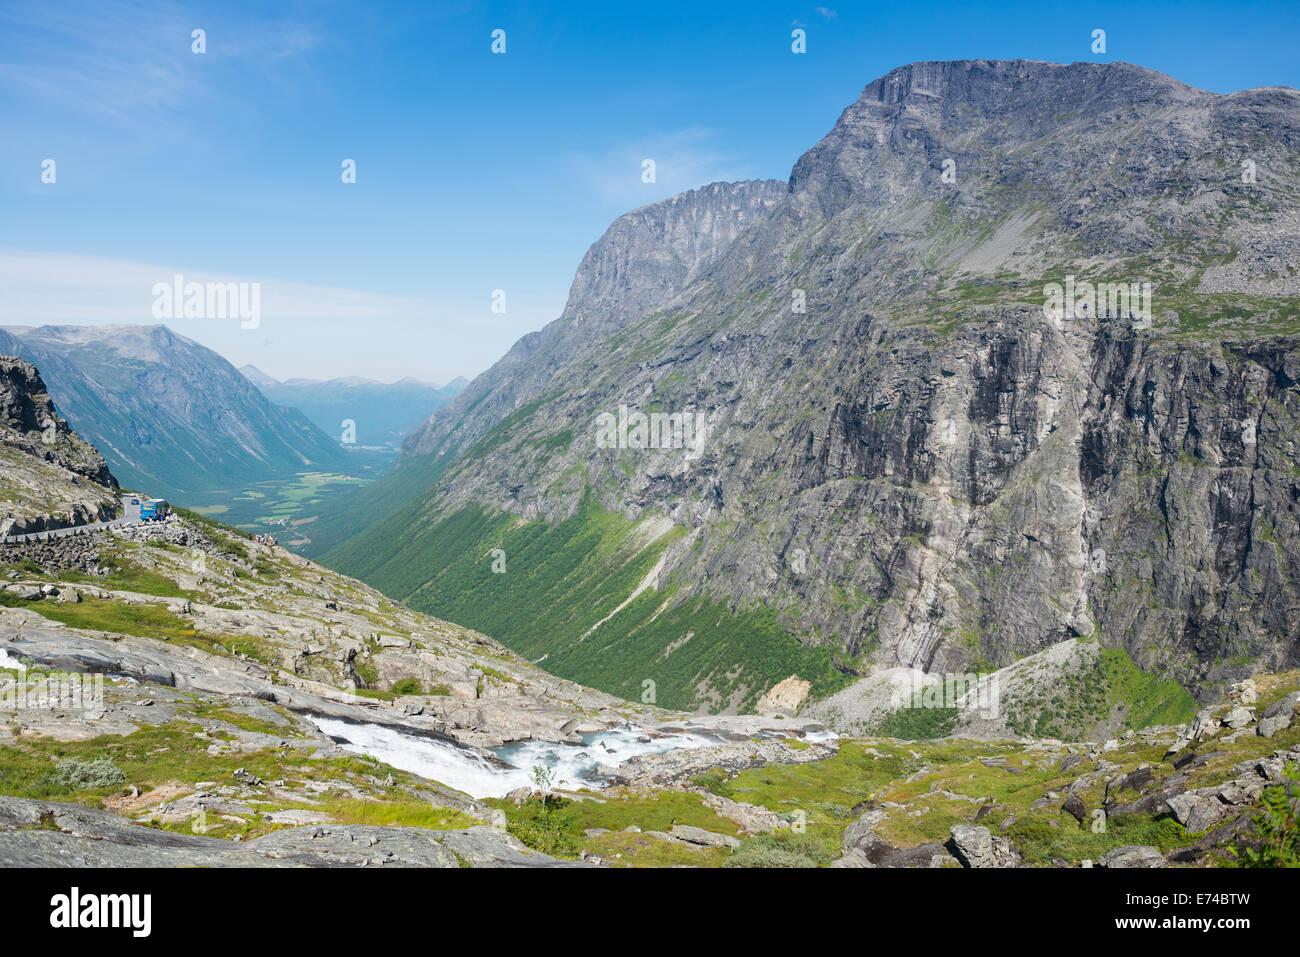 Trollstigen near Andalsnes, Norway, Scandinavia, Europe. - Stock Image